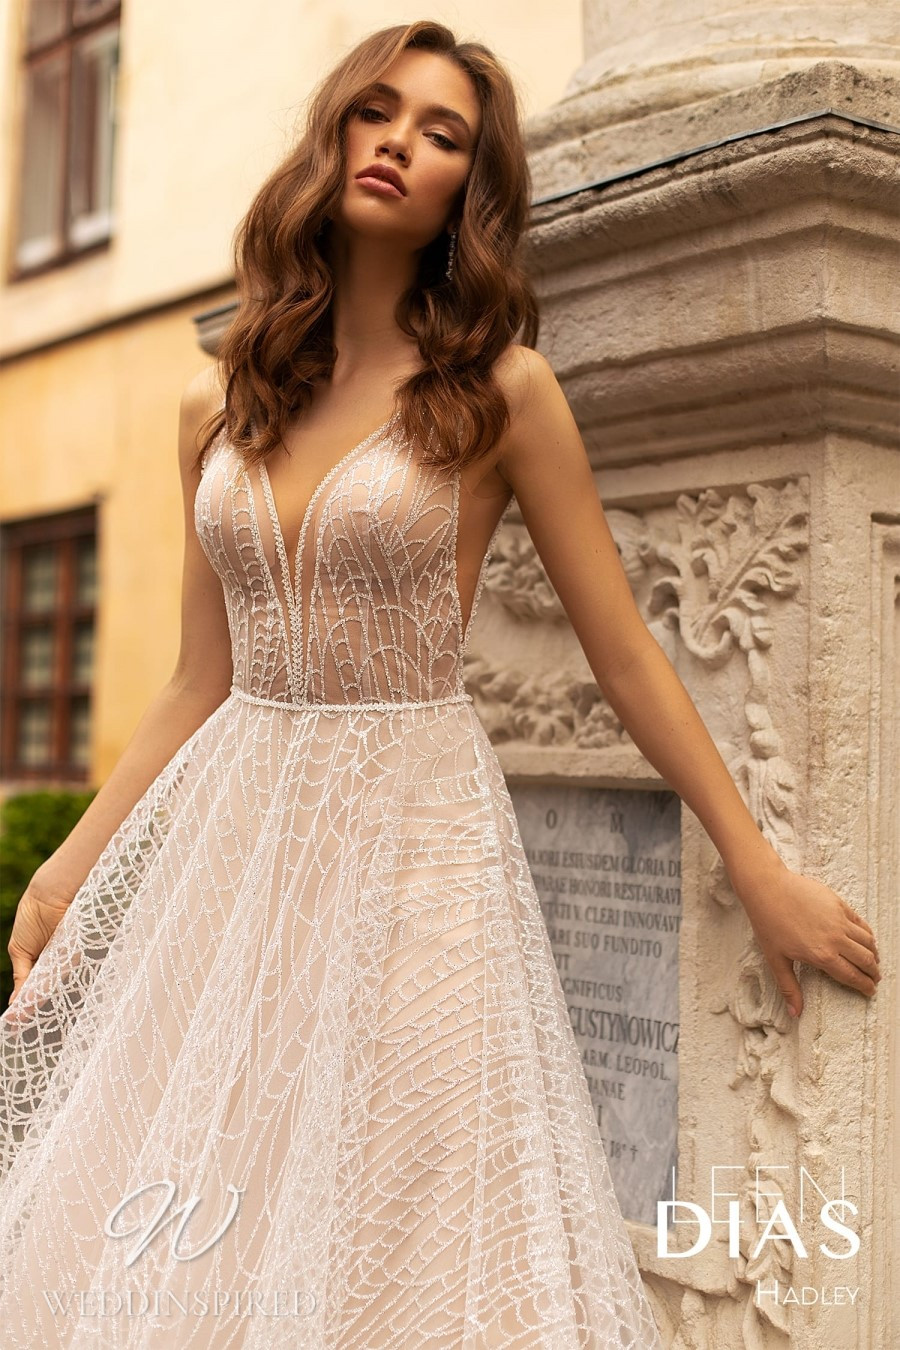 A Leen Dias 2021 tulle A-line wedding dress